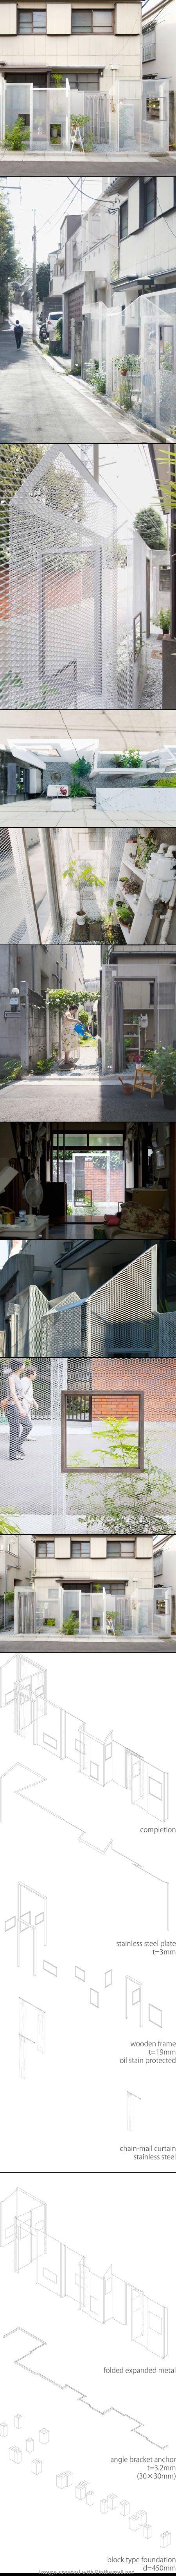 Ghost-like Architecture by Shingo Masuda and Katsuhisa Otsubo Architects - http://www.dezeen.com/2010/01/15/ghost-like-architecture-by-shingo-masuda-and-katsuhisa-otsubo-architects/